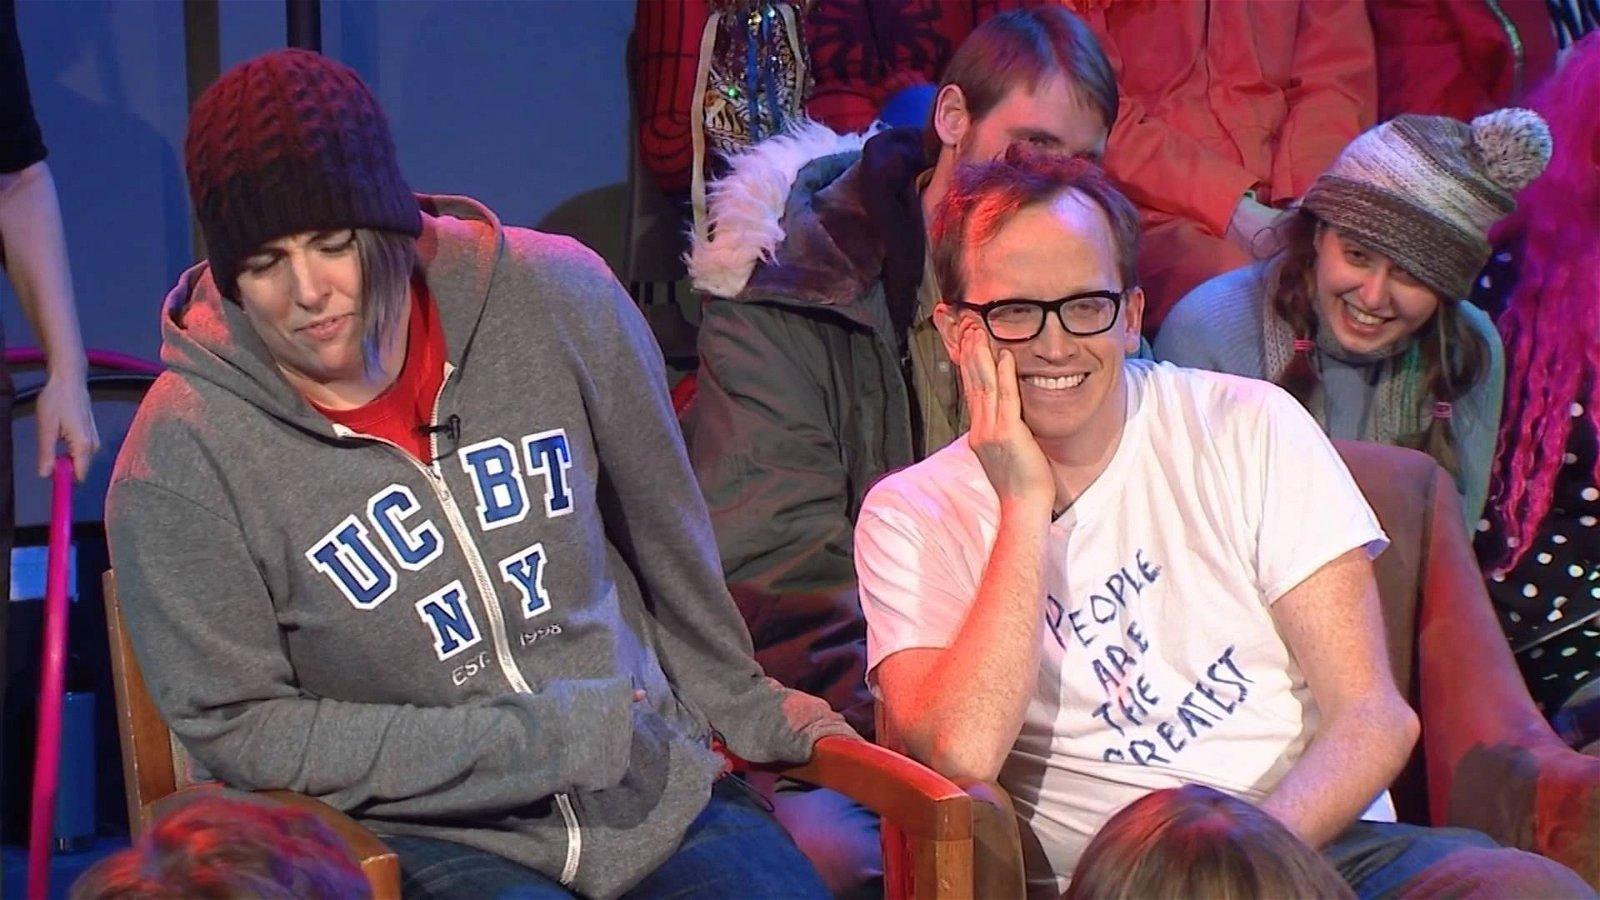 The Chris Gethard Show returns August 2nd at 11 PM EST on truTV 1